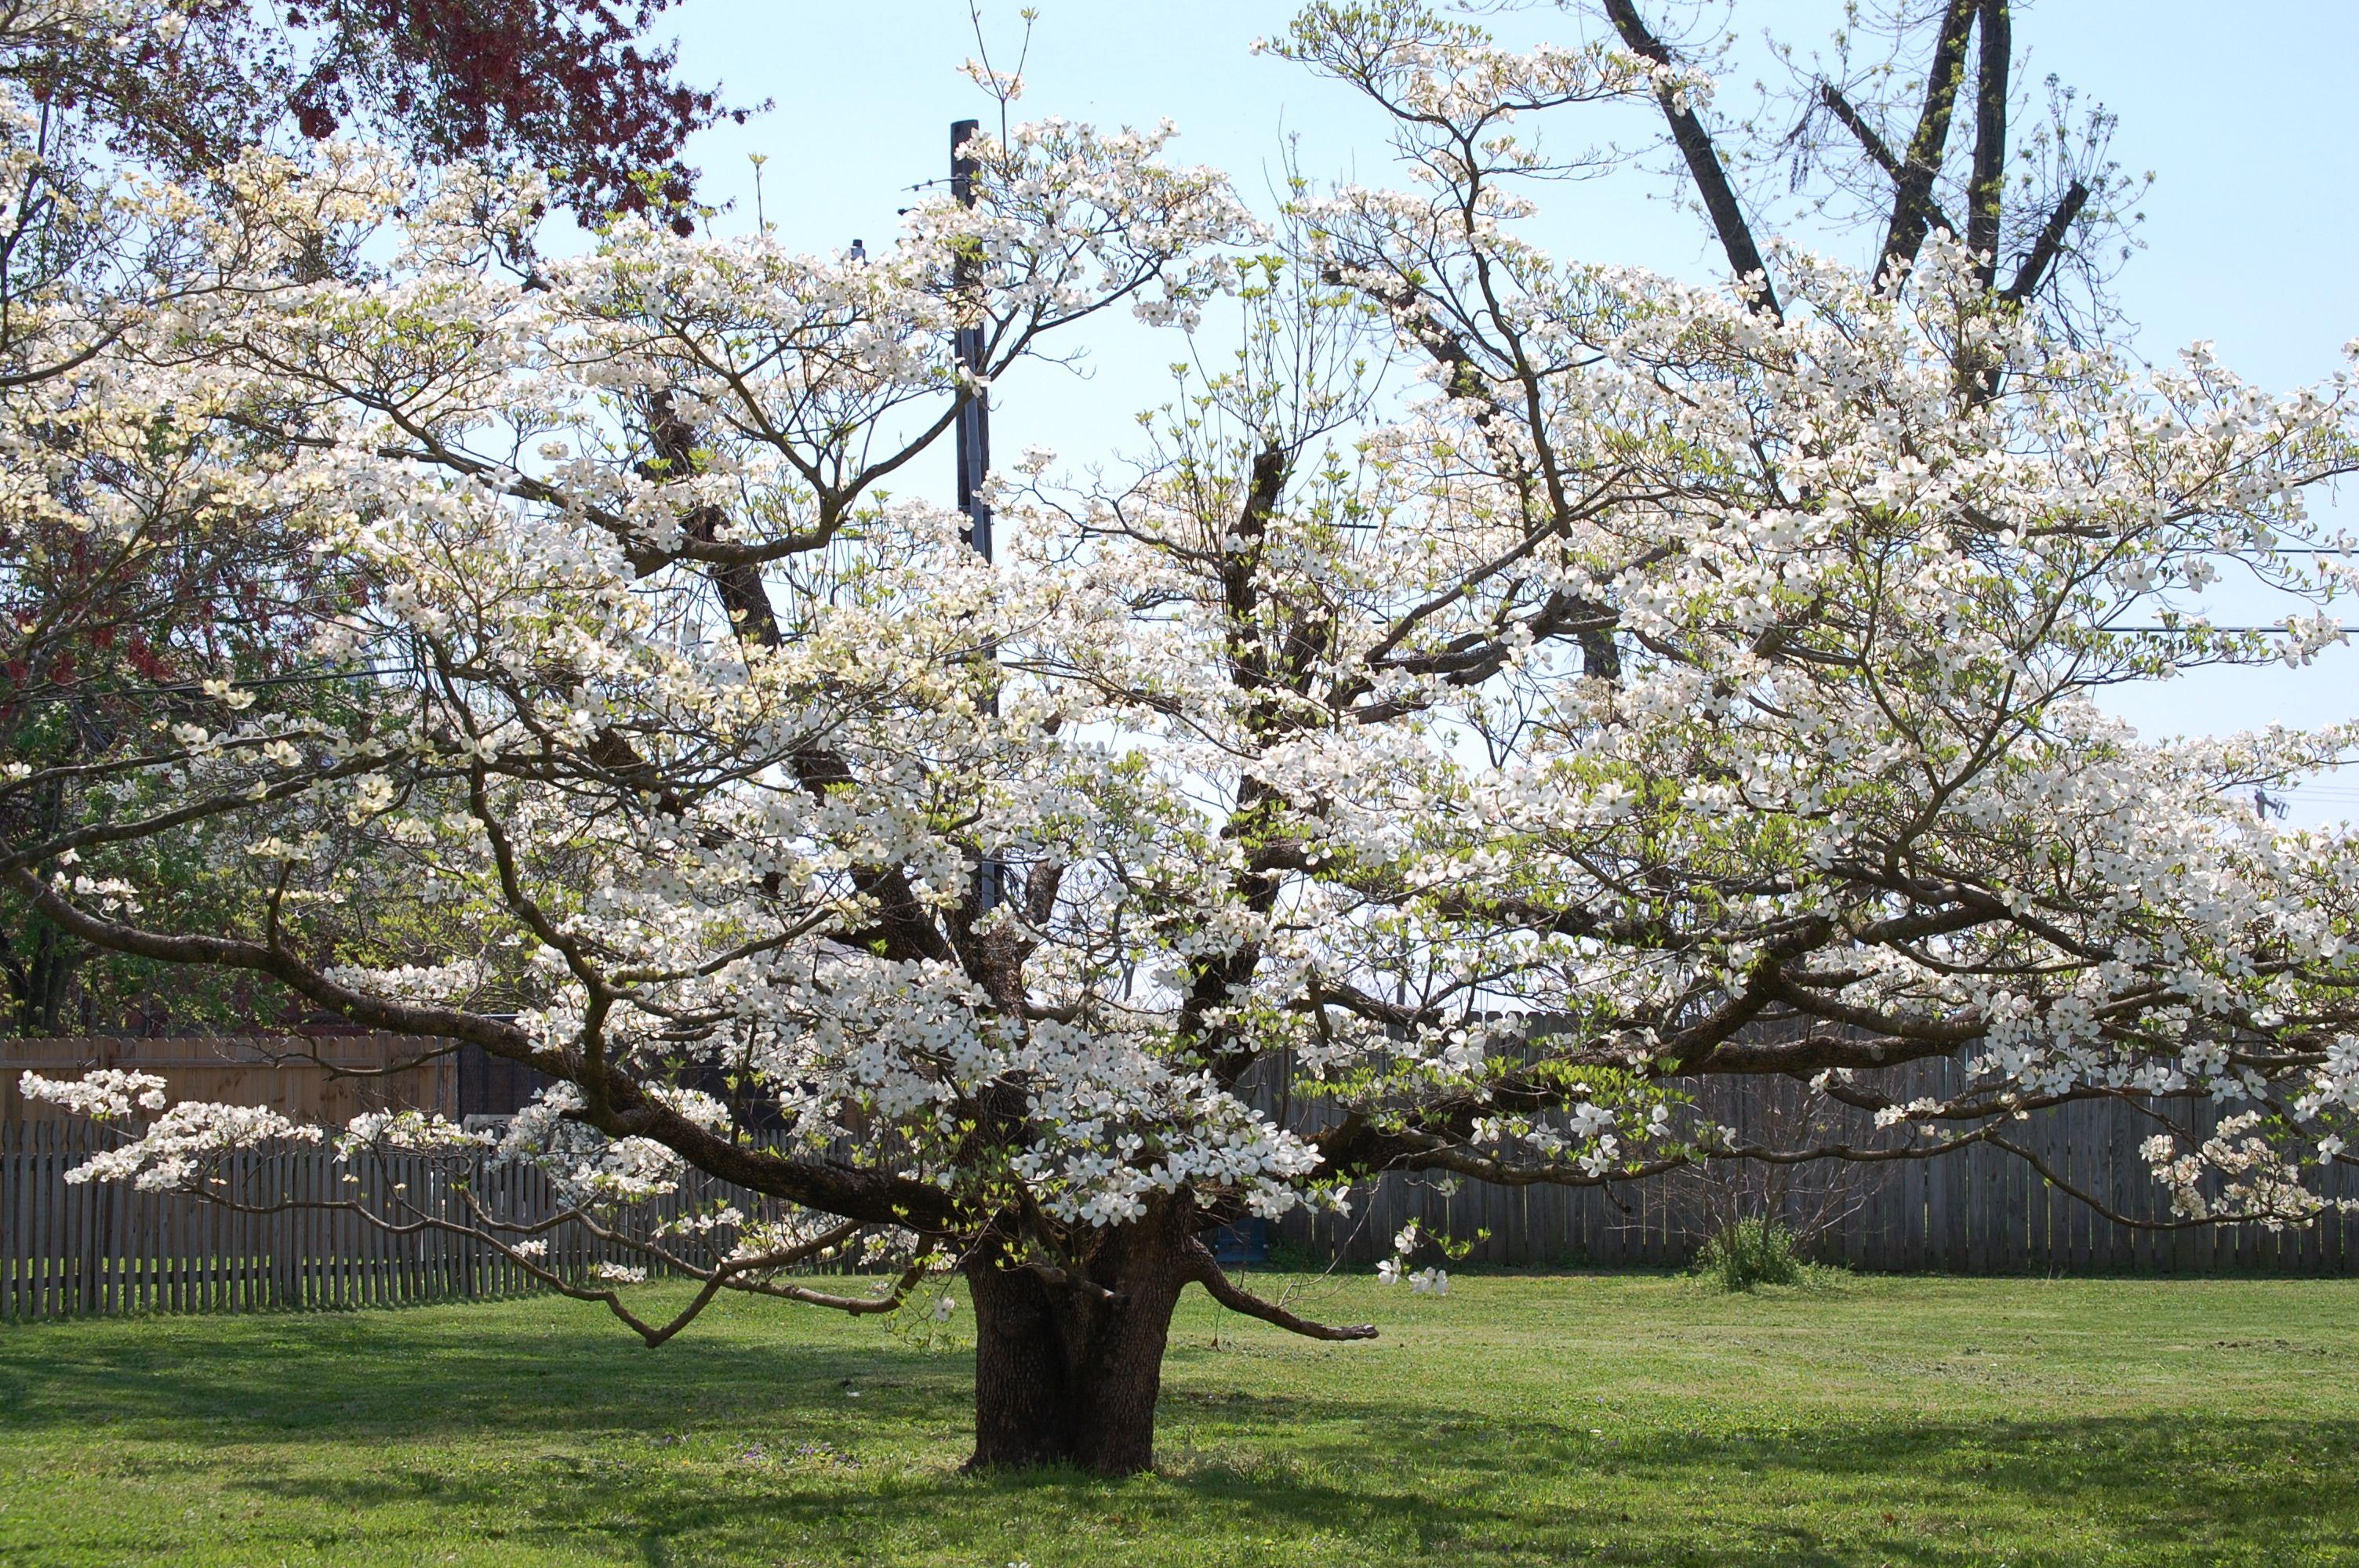 Giant Magnolia Tree In Charleston Missouri Flowers Trees And